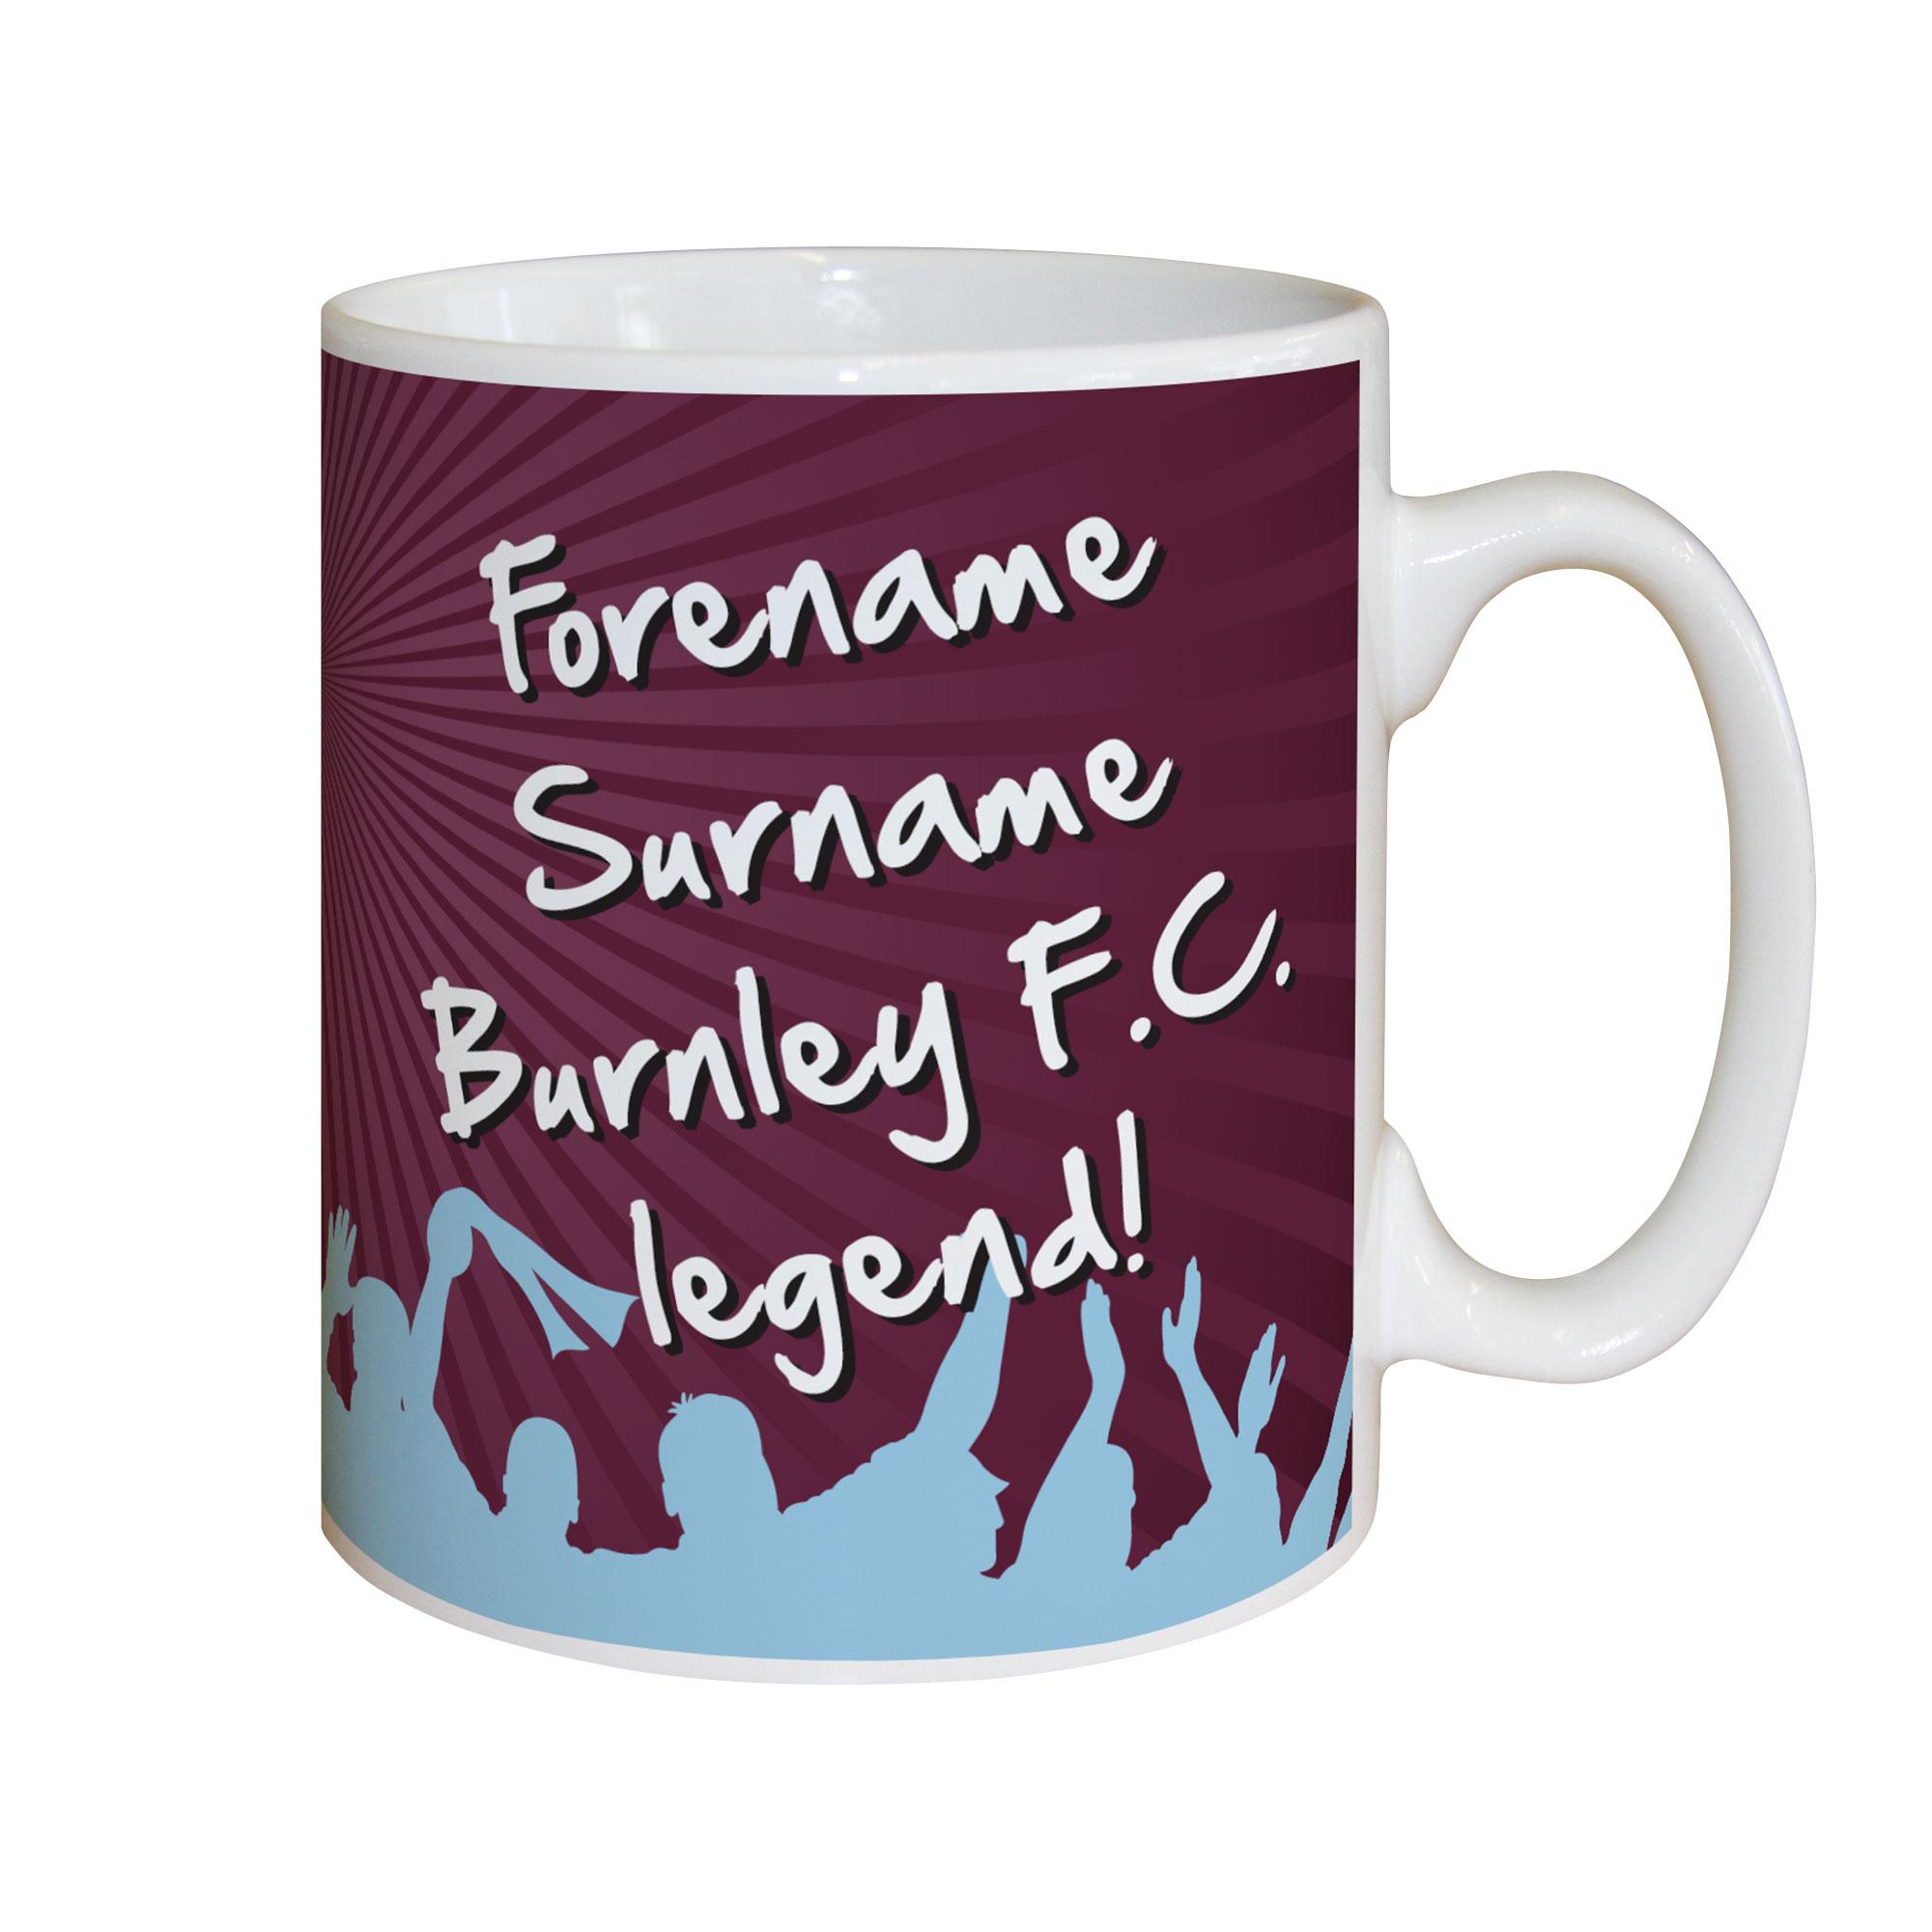 Burnley FC Legend Mug